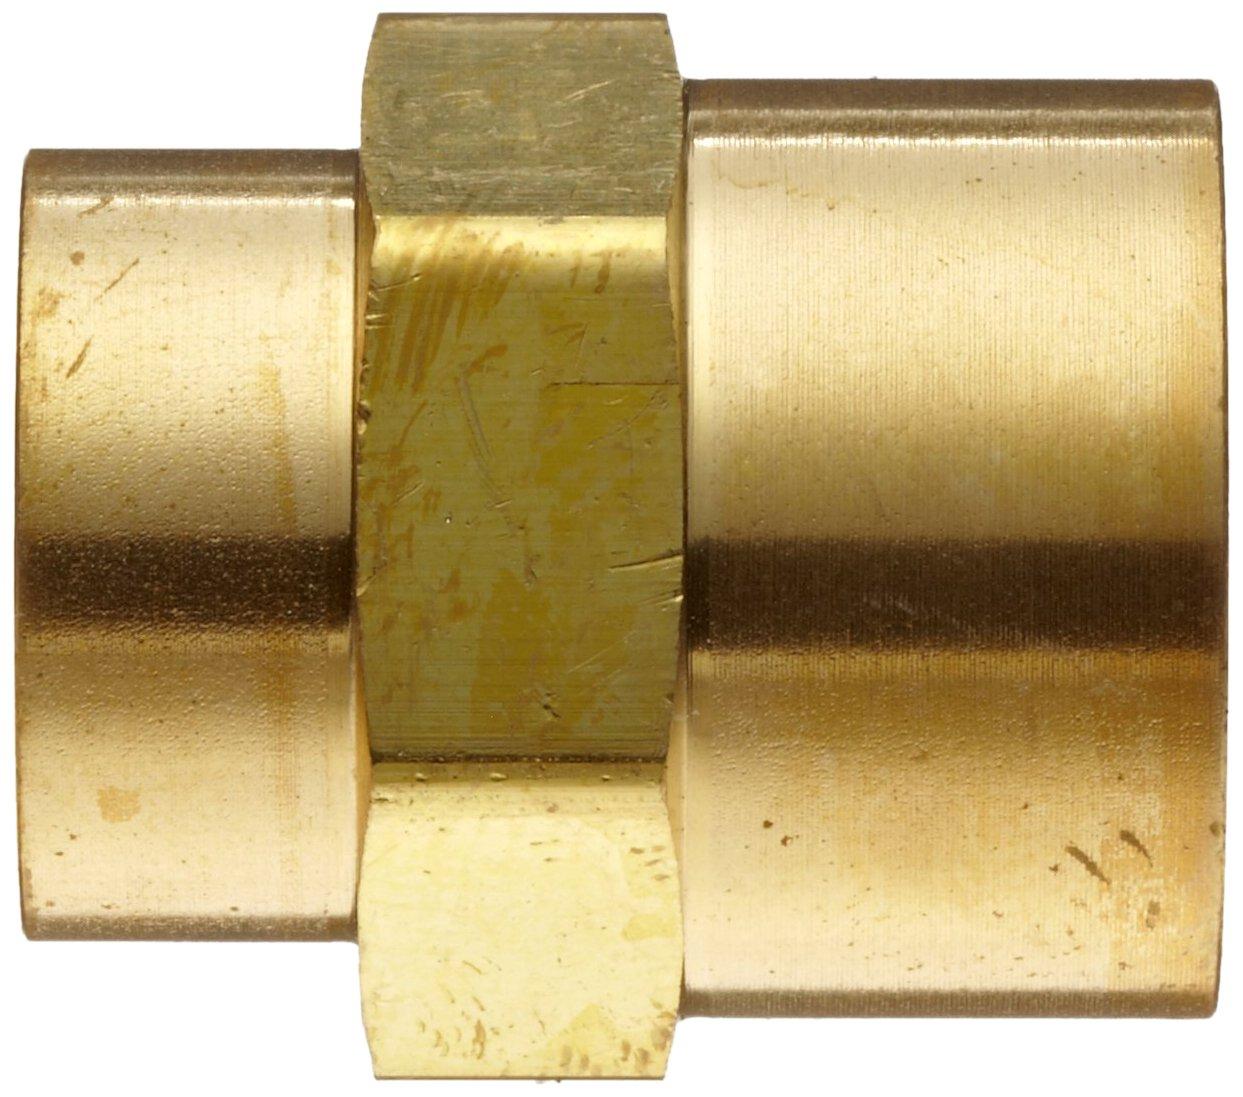 1//4 NPT Female X 1//8 NPT Female Hex Coupling Parker Brass Pipe Fitting